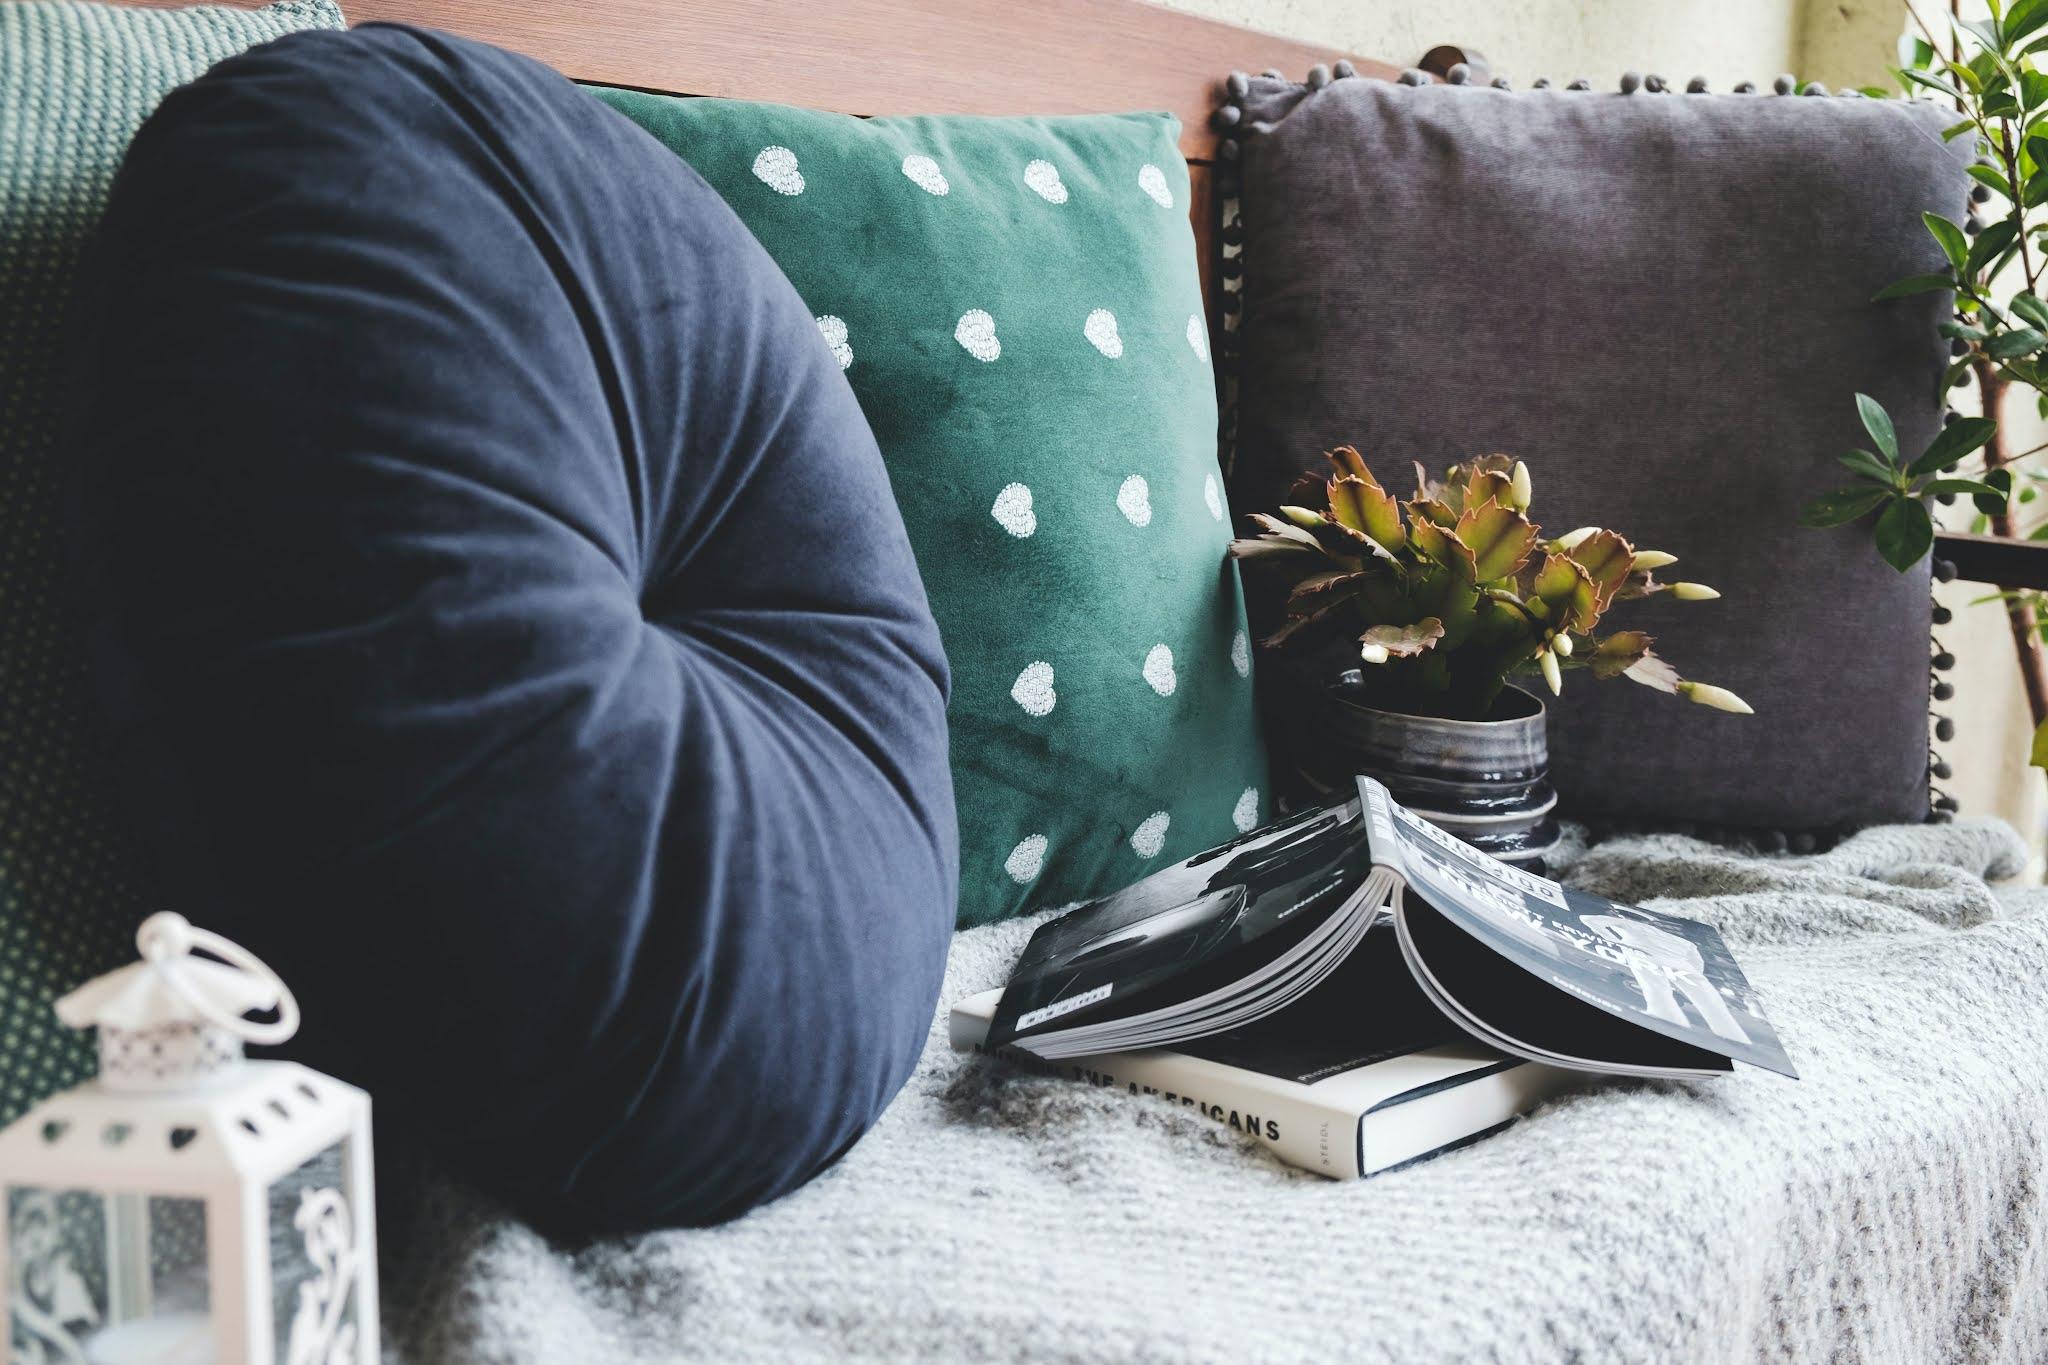 a cozy sofa area from Unsplash free stock image Krisztina Papp